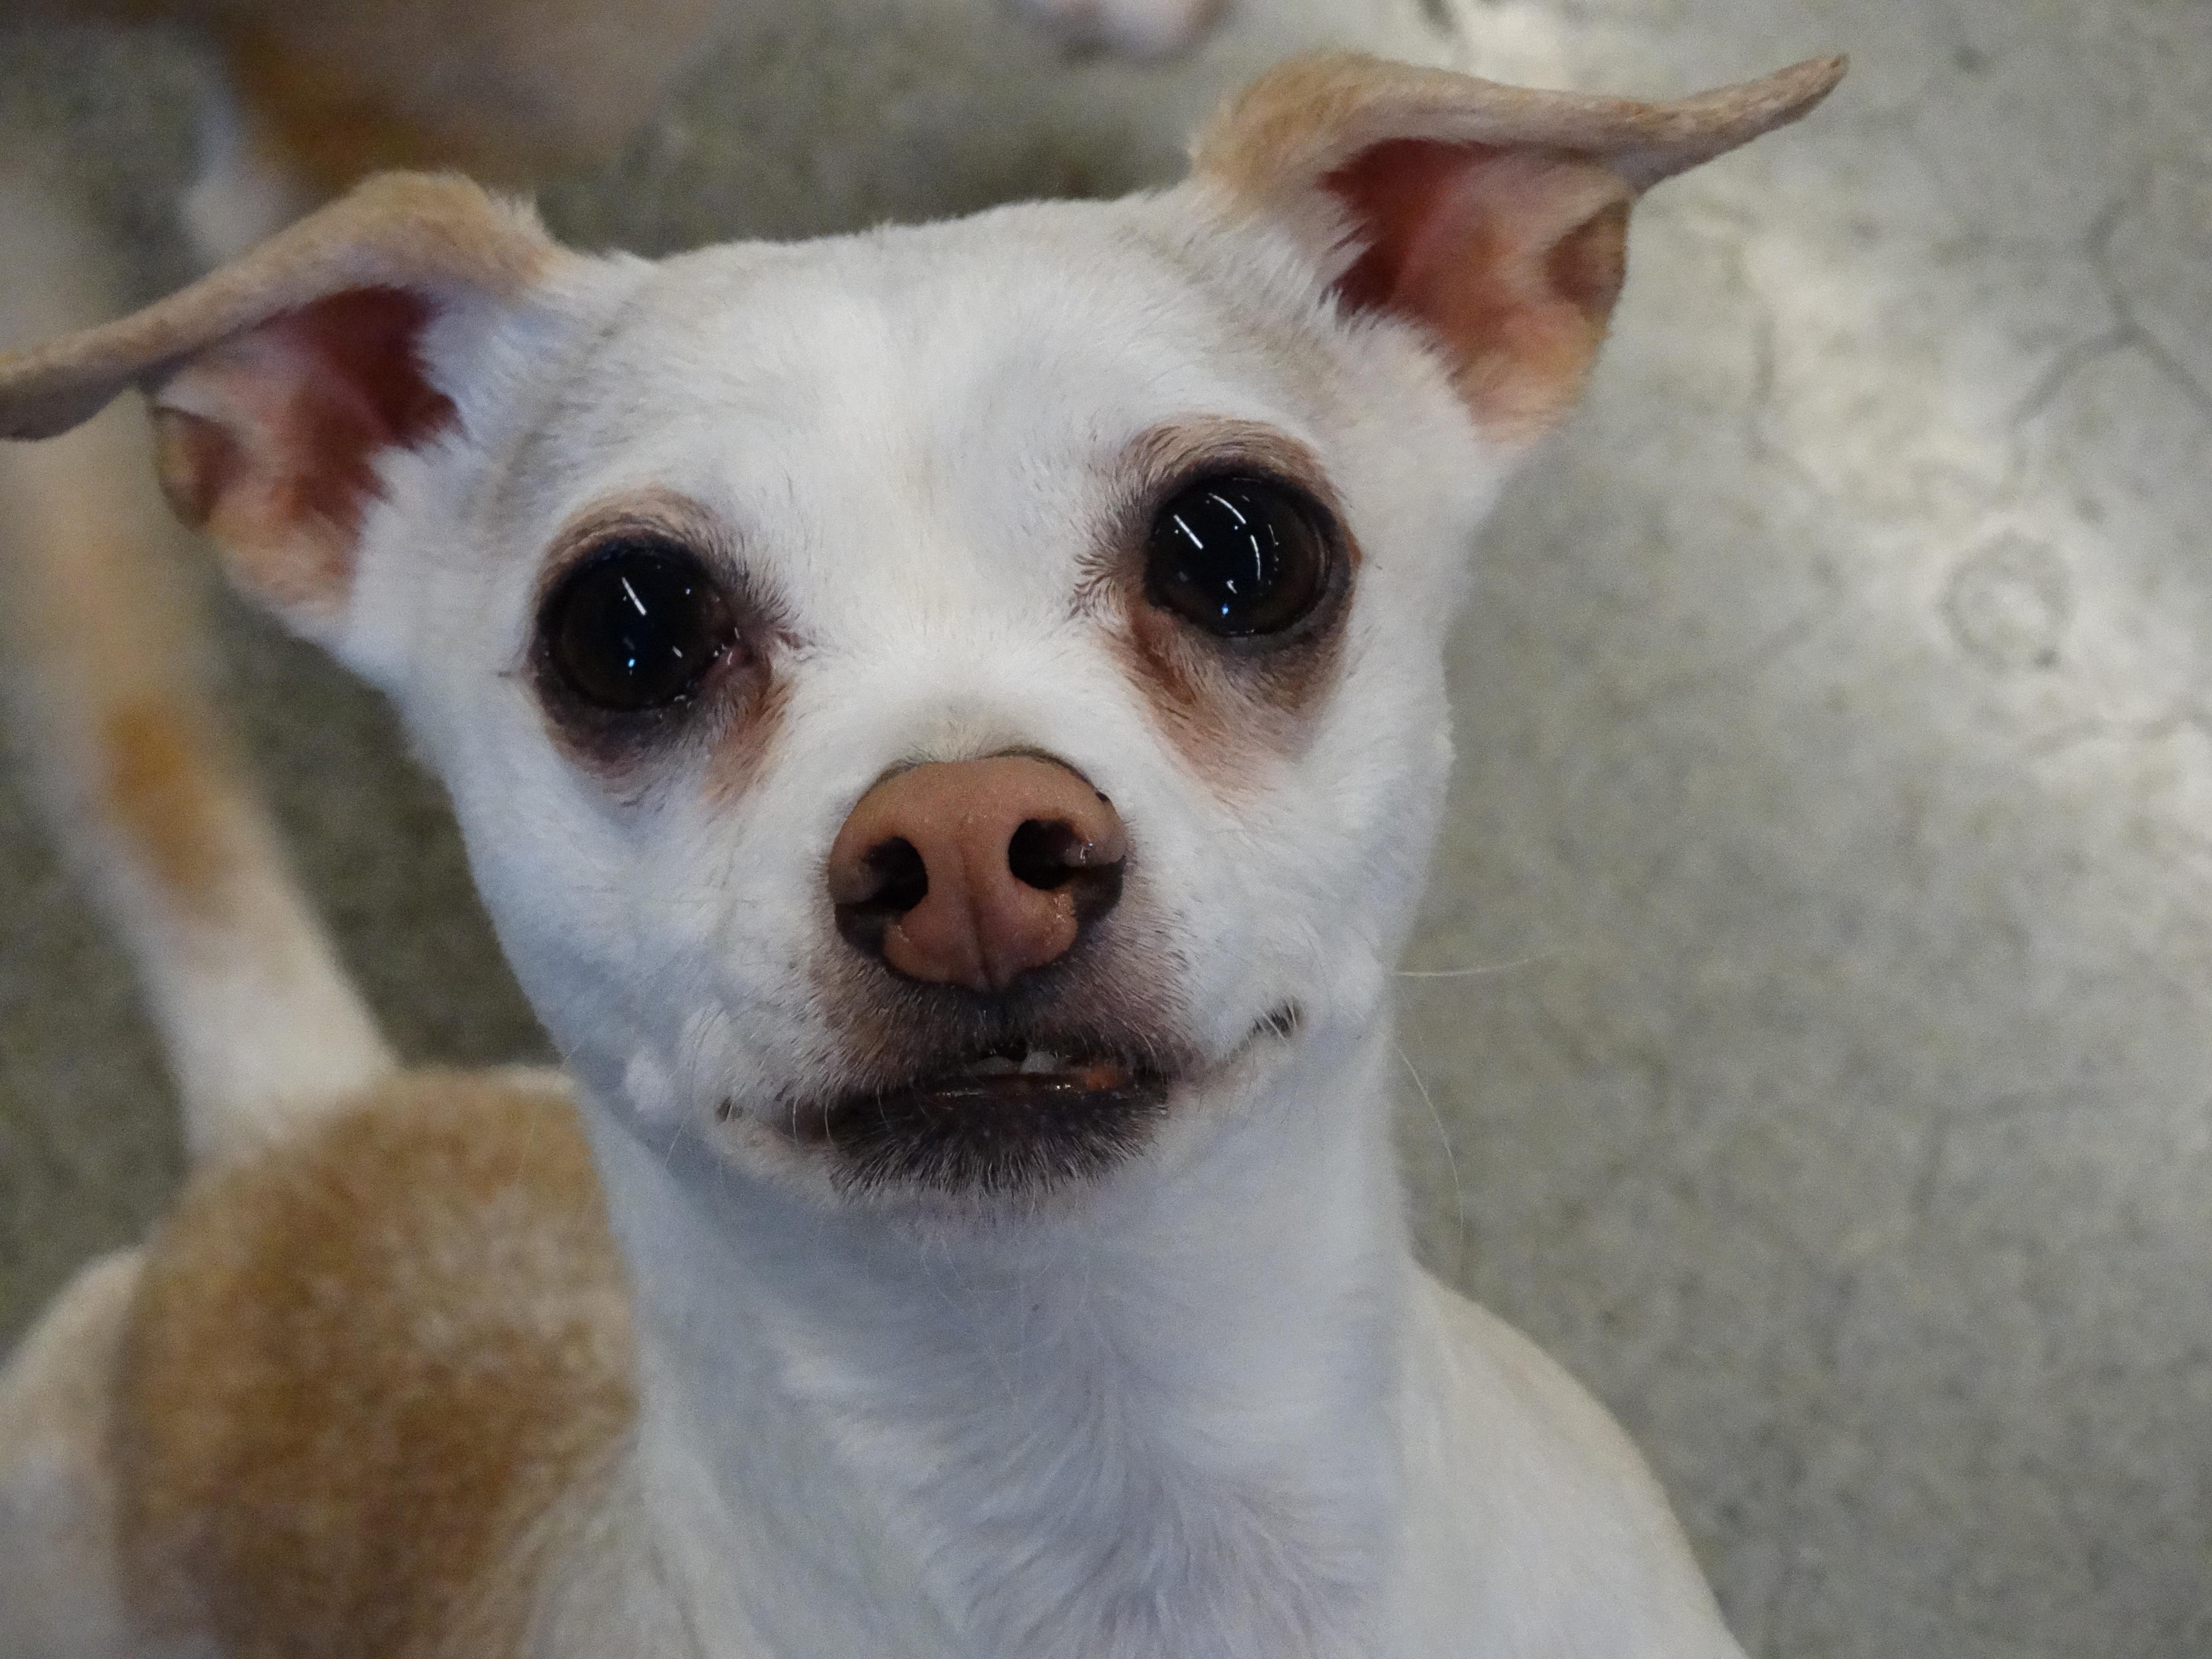 Dog for Adoption – Pucchini (Pooch), near Tacoma, WA   Petfinder